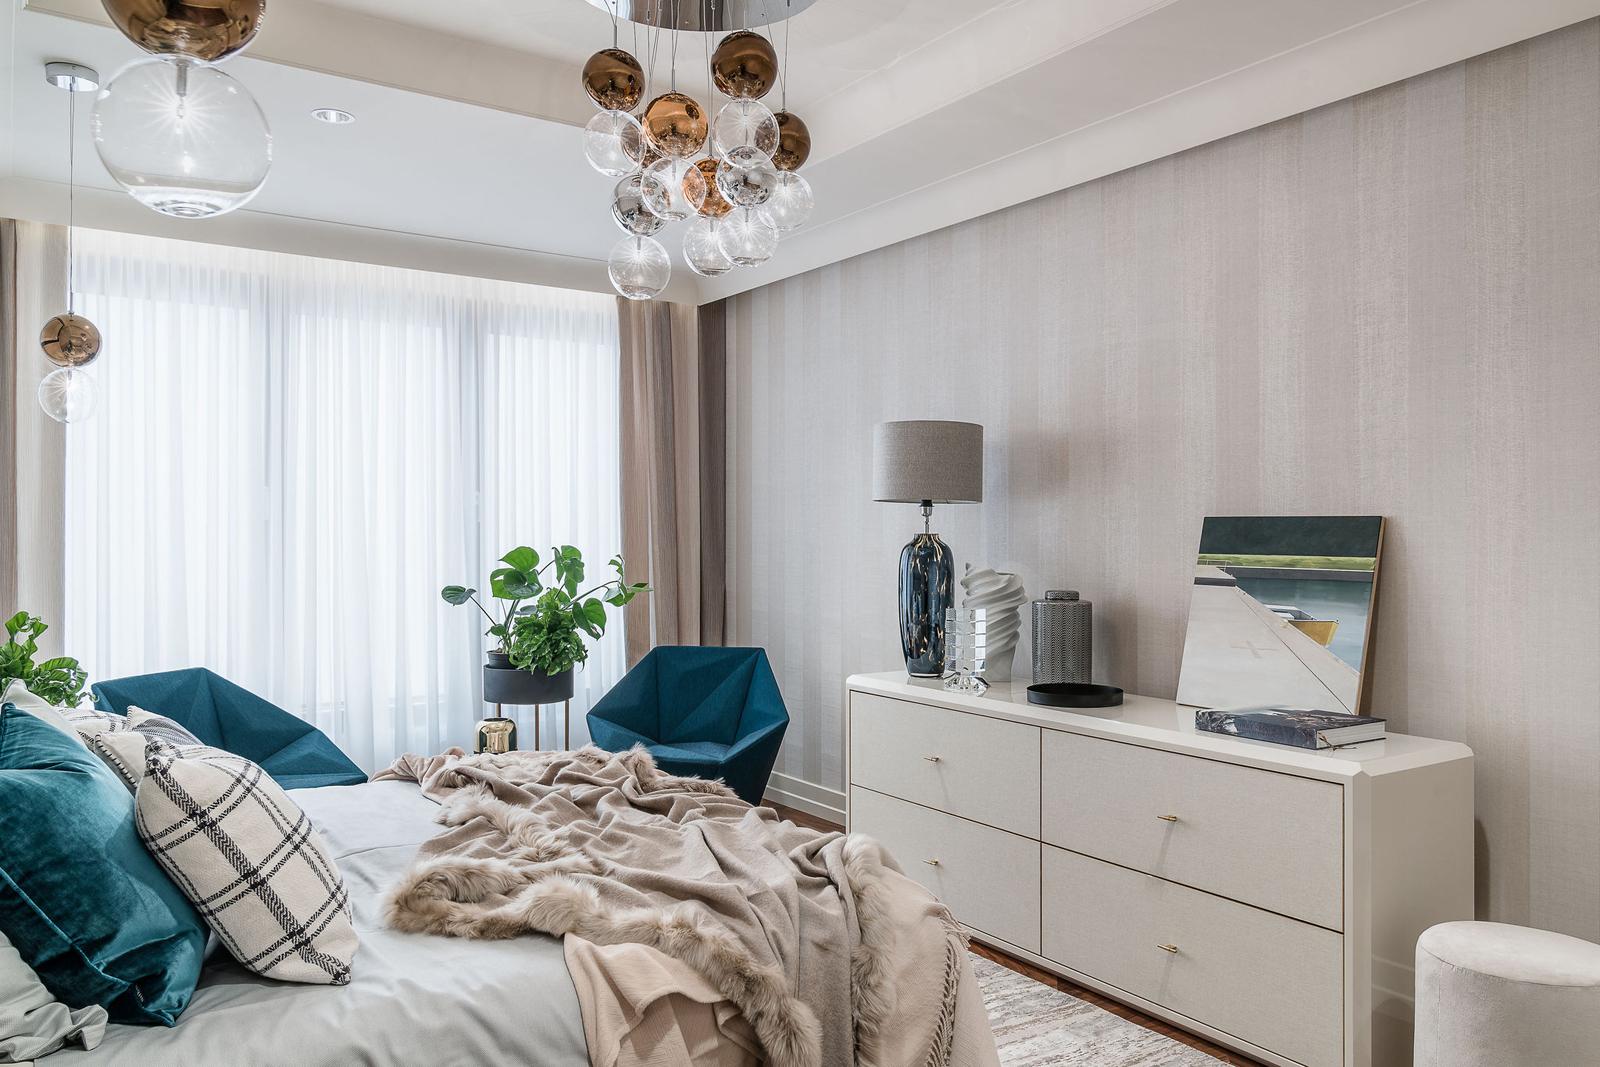 apartament w Gdyni pełen stylowych detali